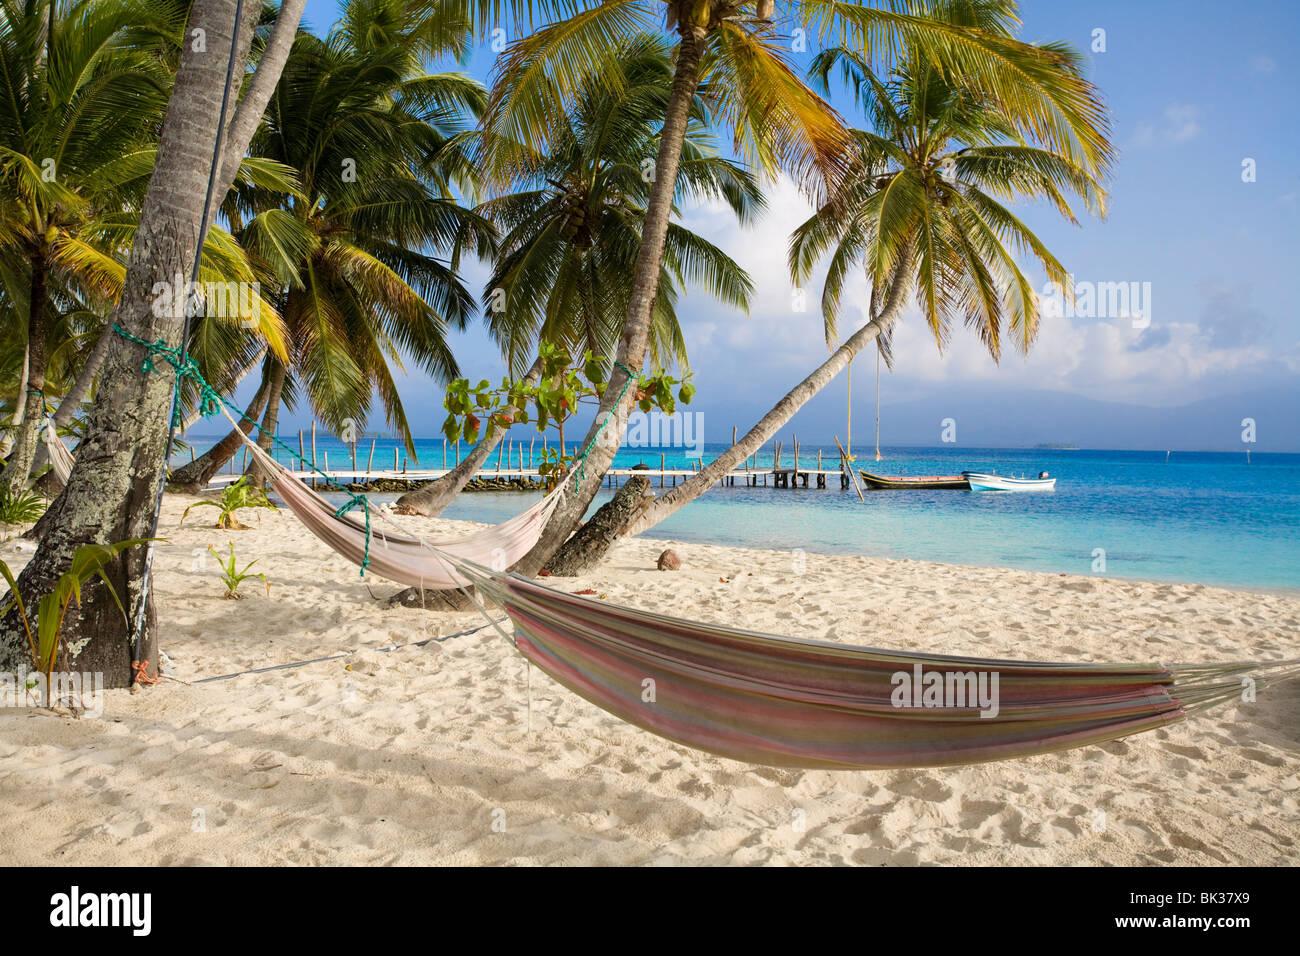 Hammocks hanging between palm trees, Kuanidup Grande, Comarca de Kuna Yala, San Blas Islands, Panama, Central America - Stock Image